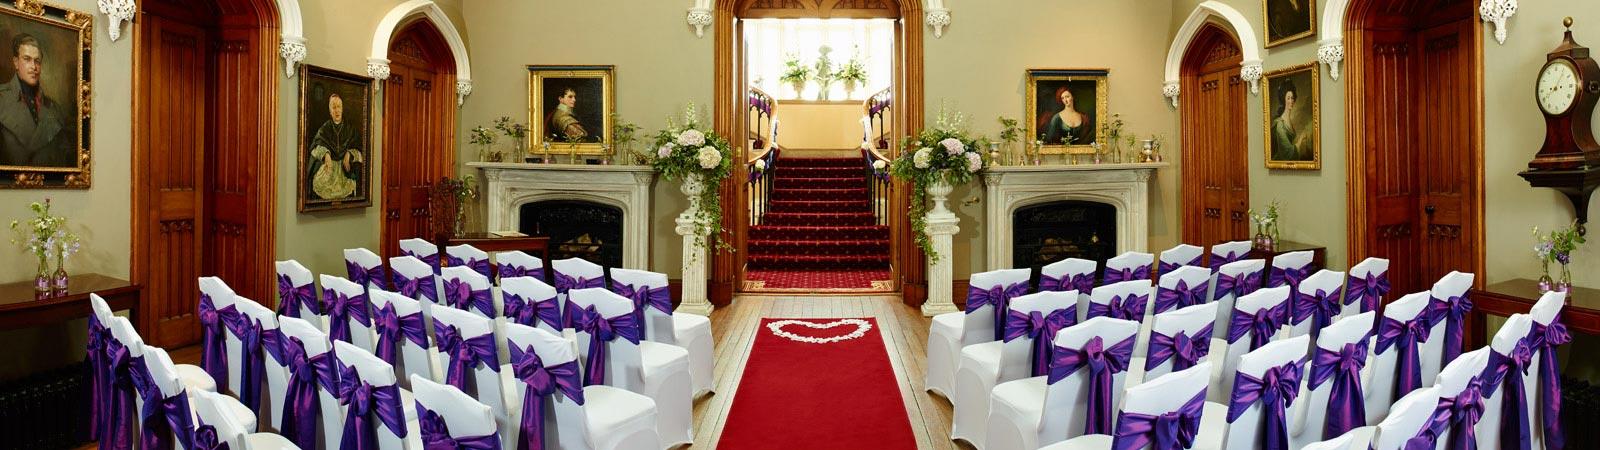 Wedding Venue Ayrshire